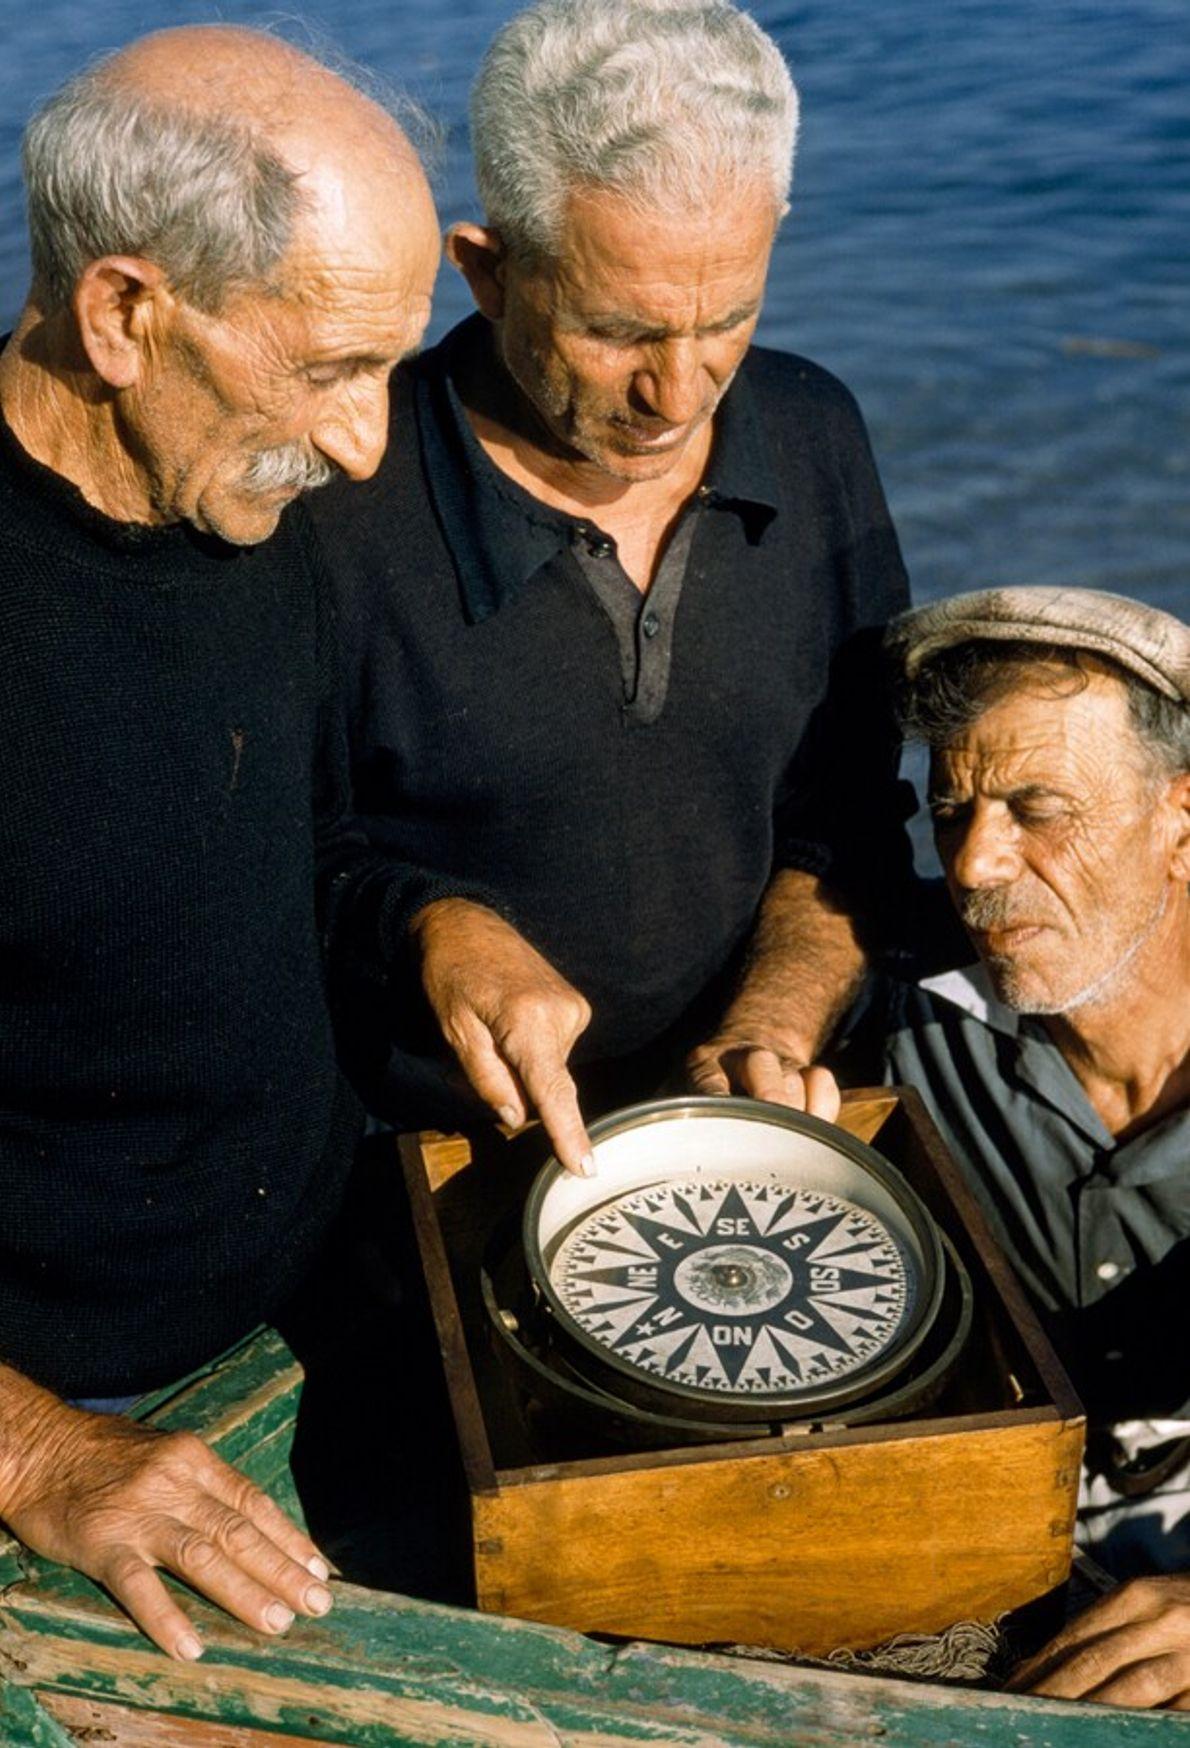 Three fisherman regard an antique mariners' compass off the coast of Amalfi, 1959.